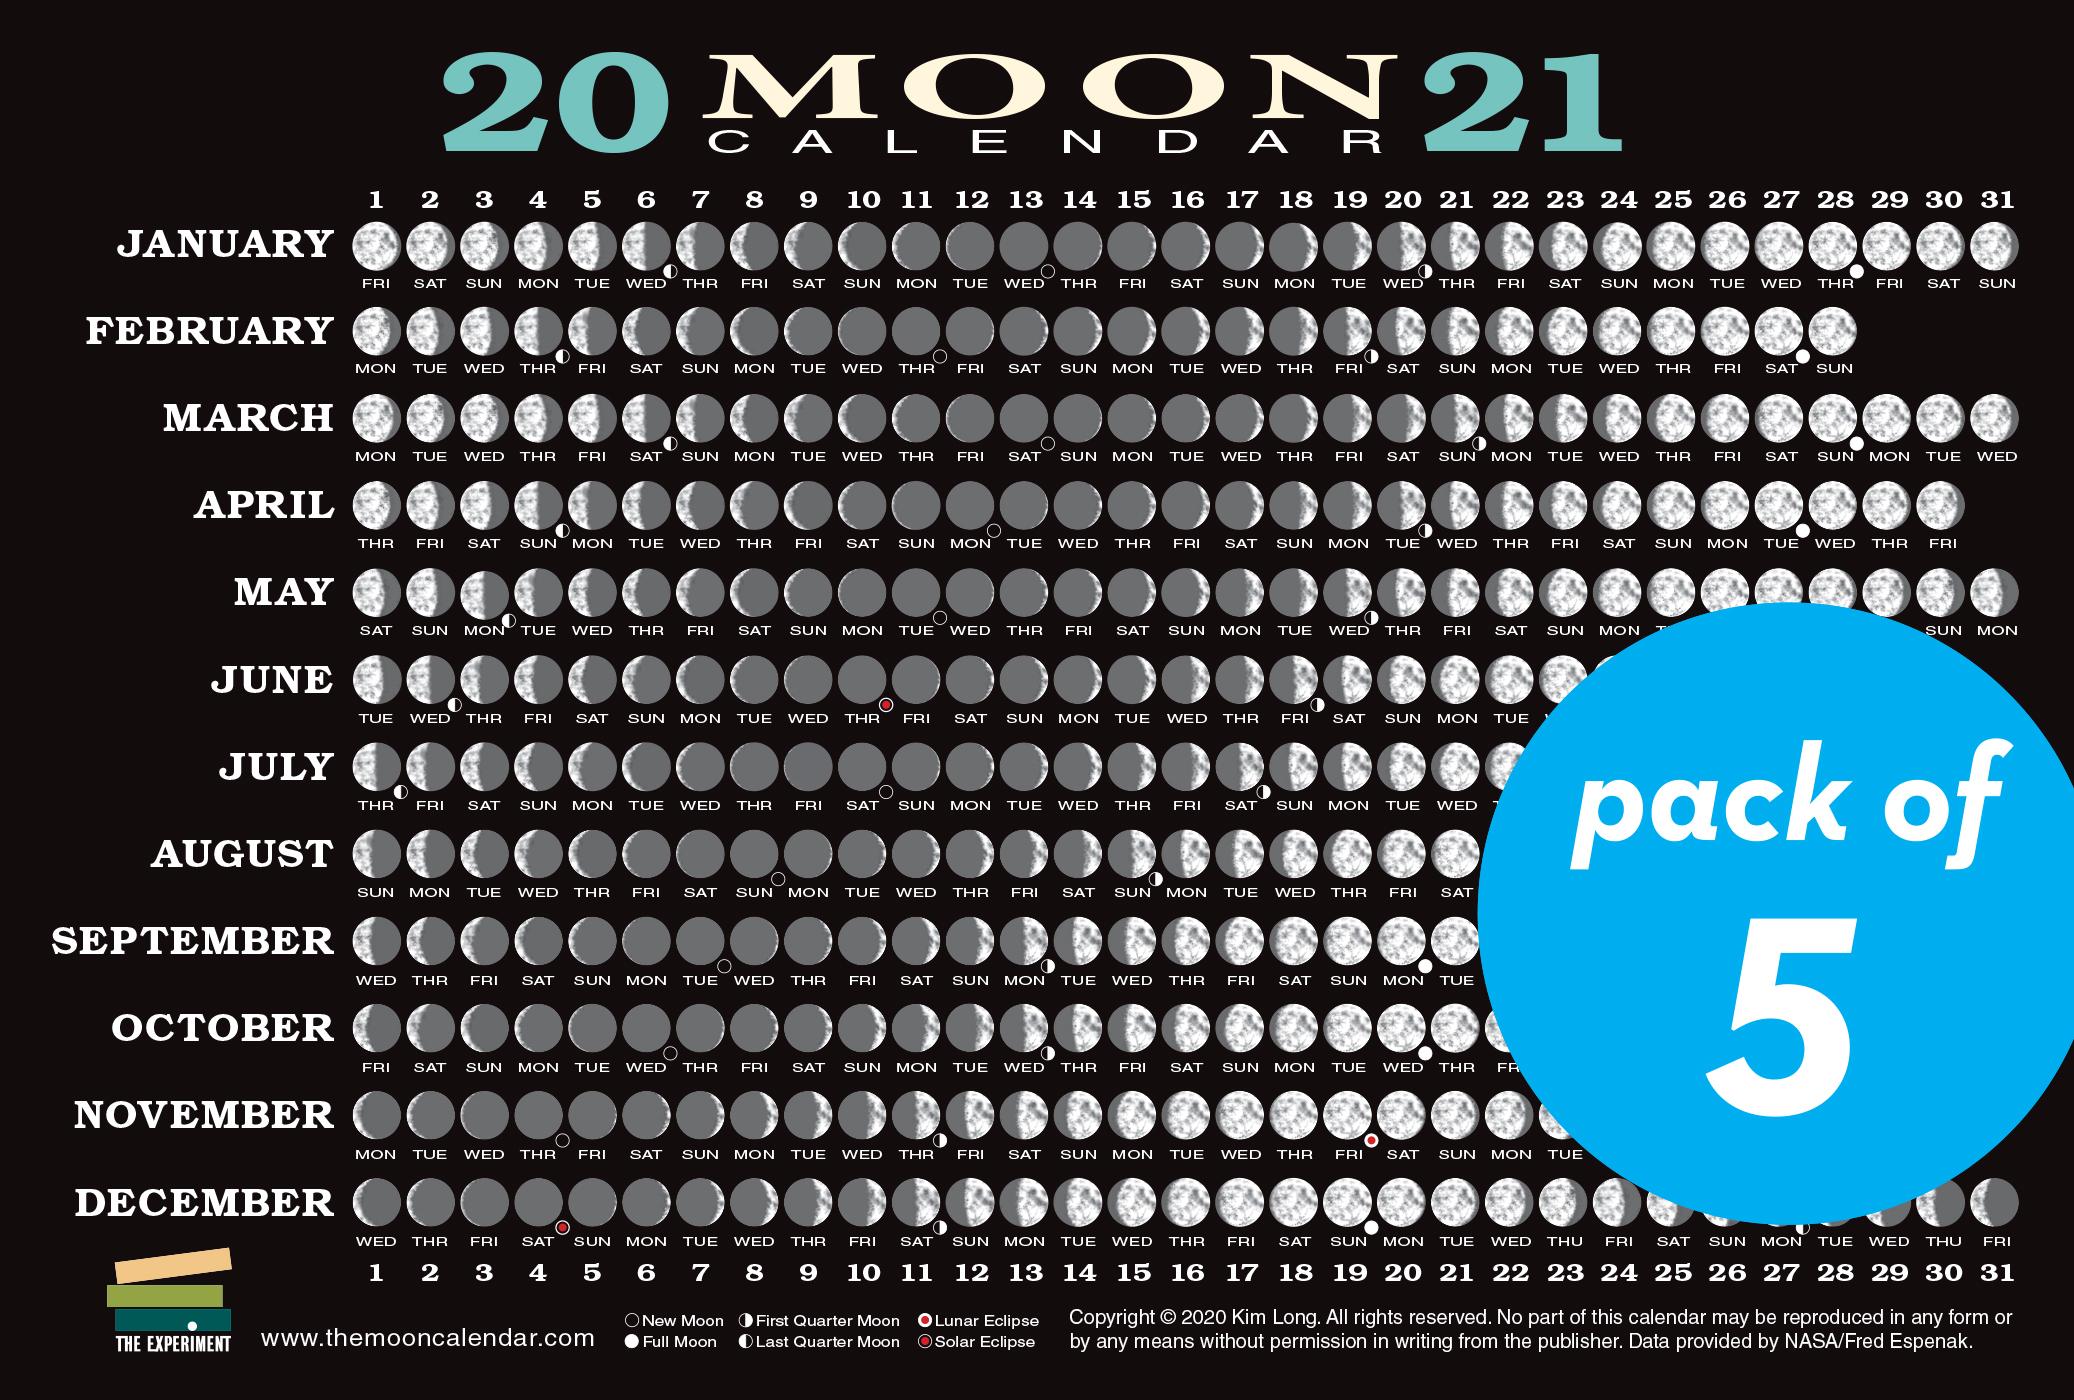 2021 Moon Calendar Card (5 pack) - Workman Publishing